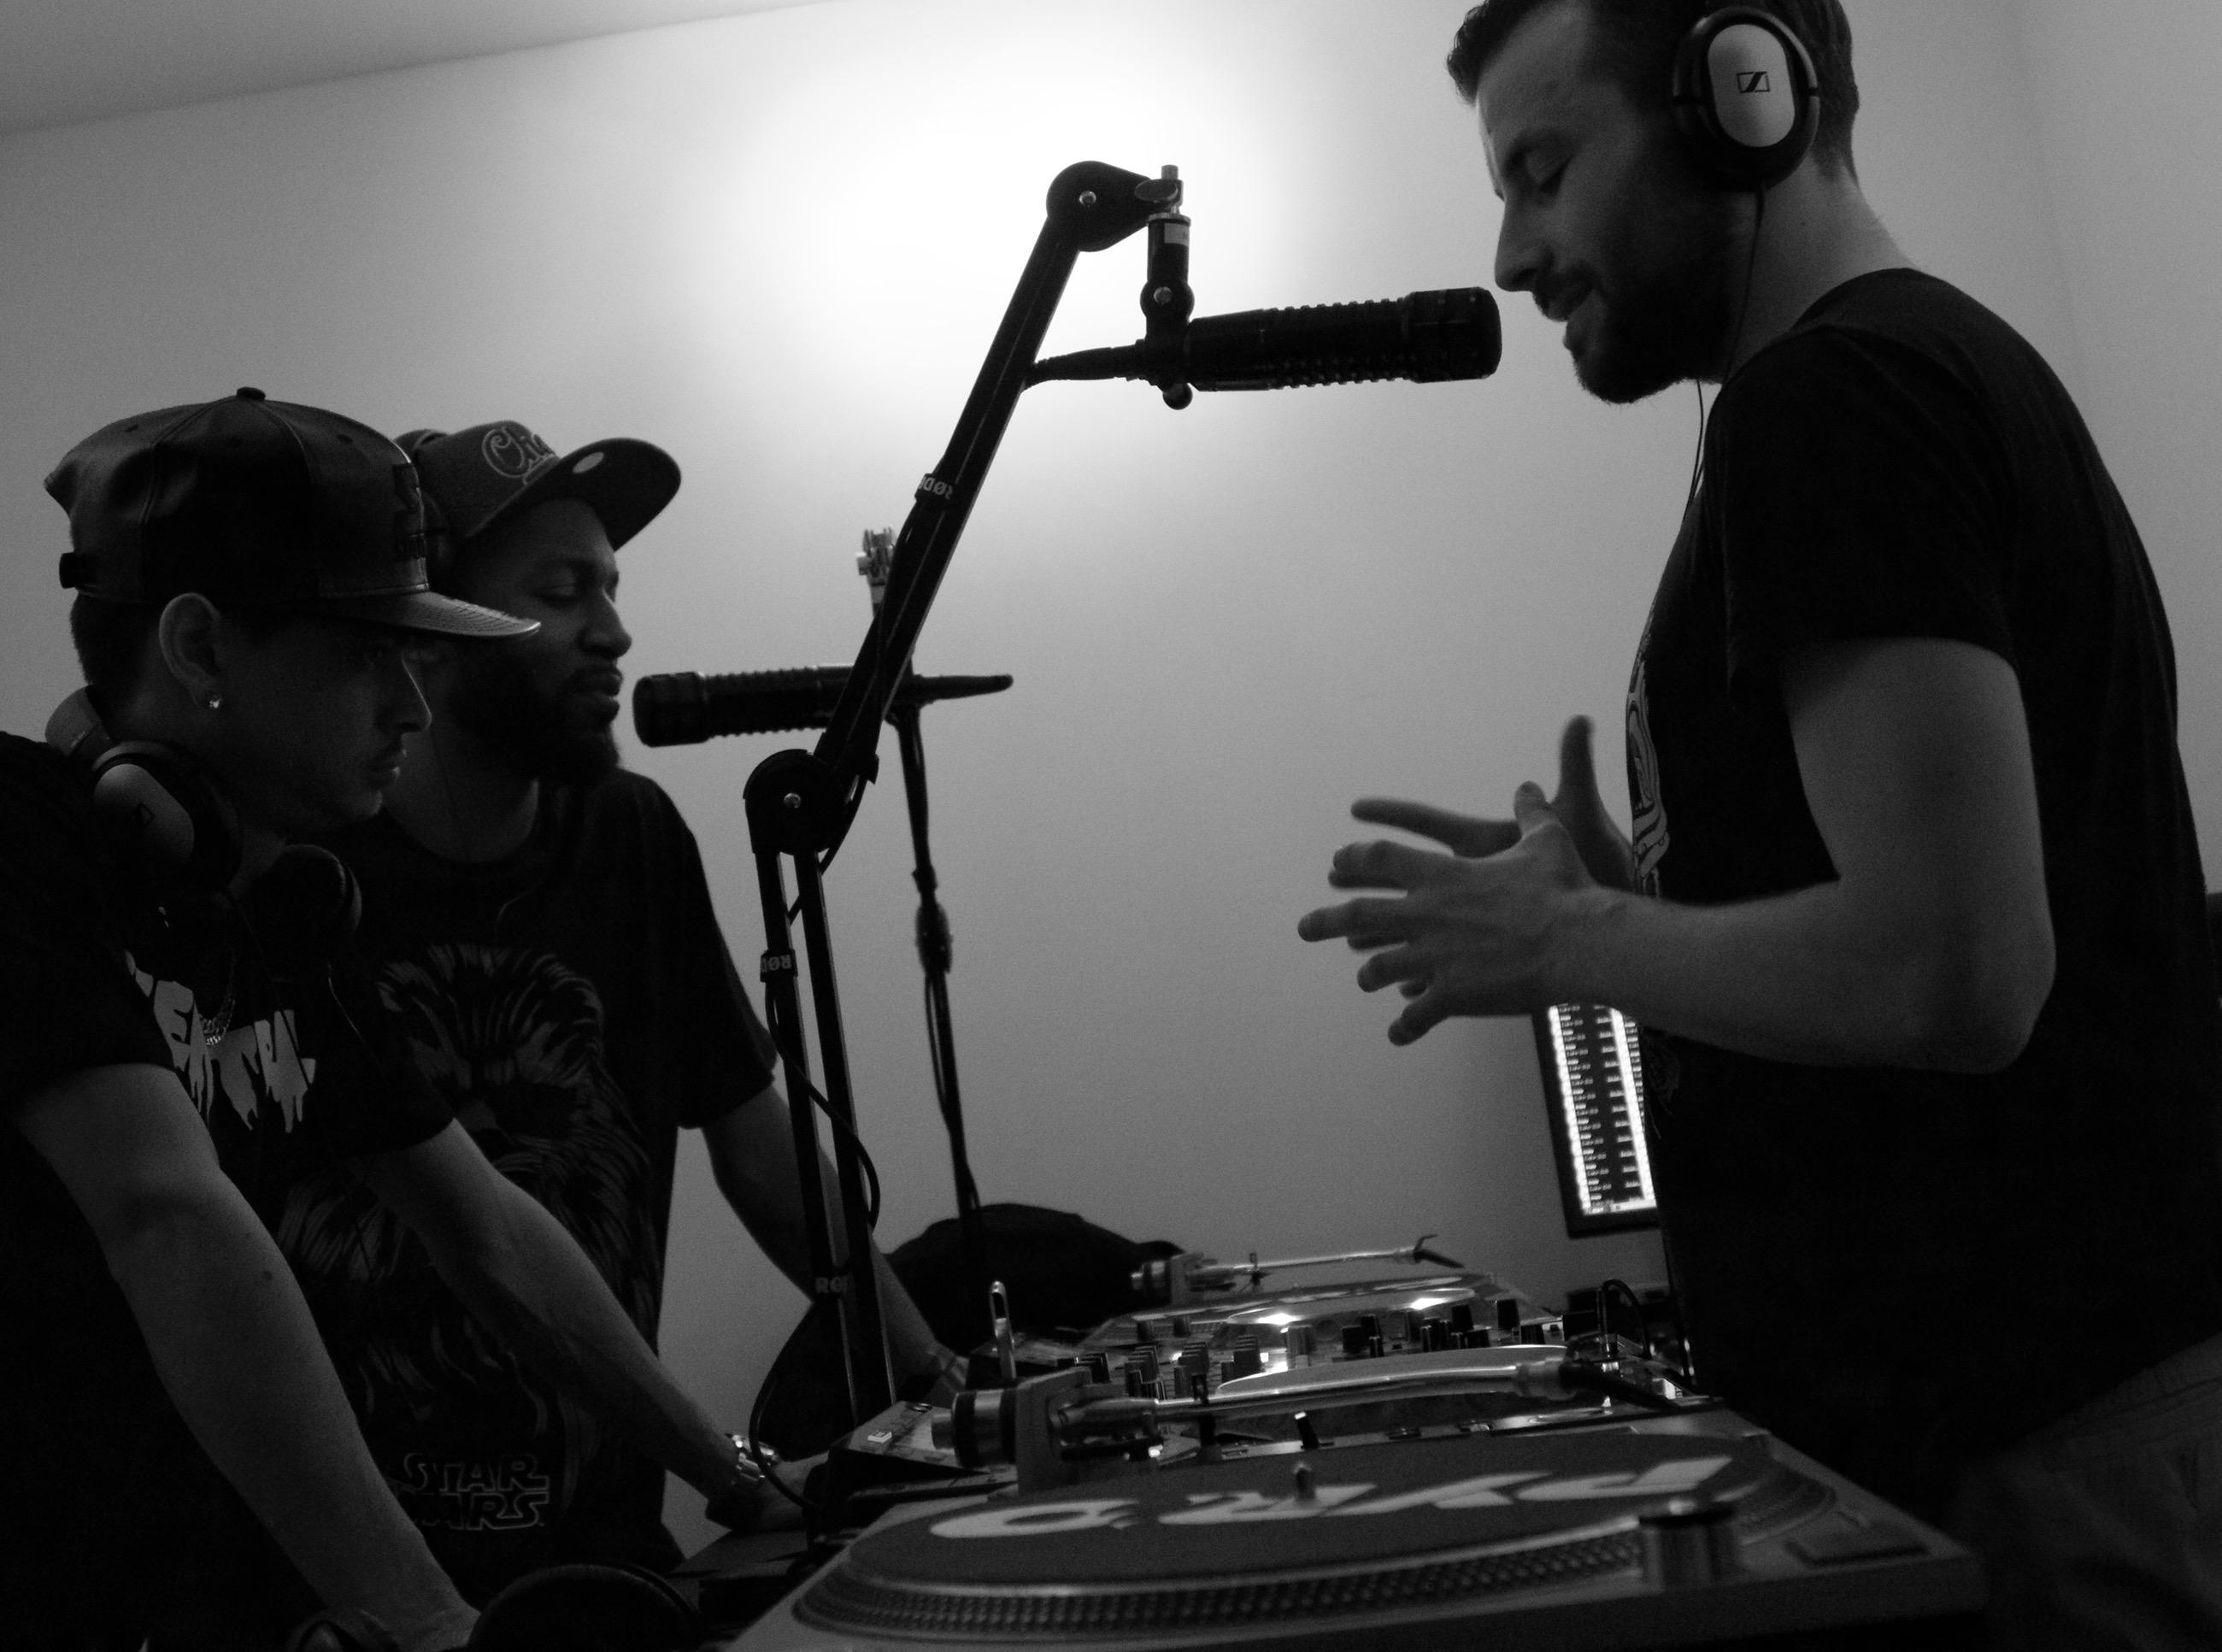 The Blatantly Blynu Show, Nick Russell, Micall Parknsun, PyroRadio, Pyro, PyroRadio.com